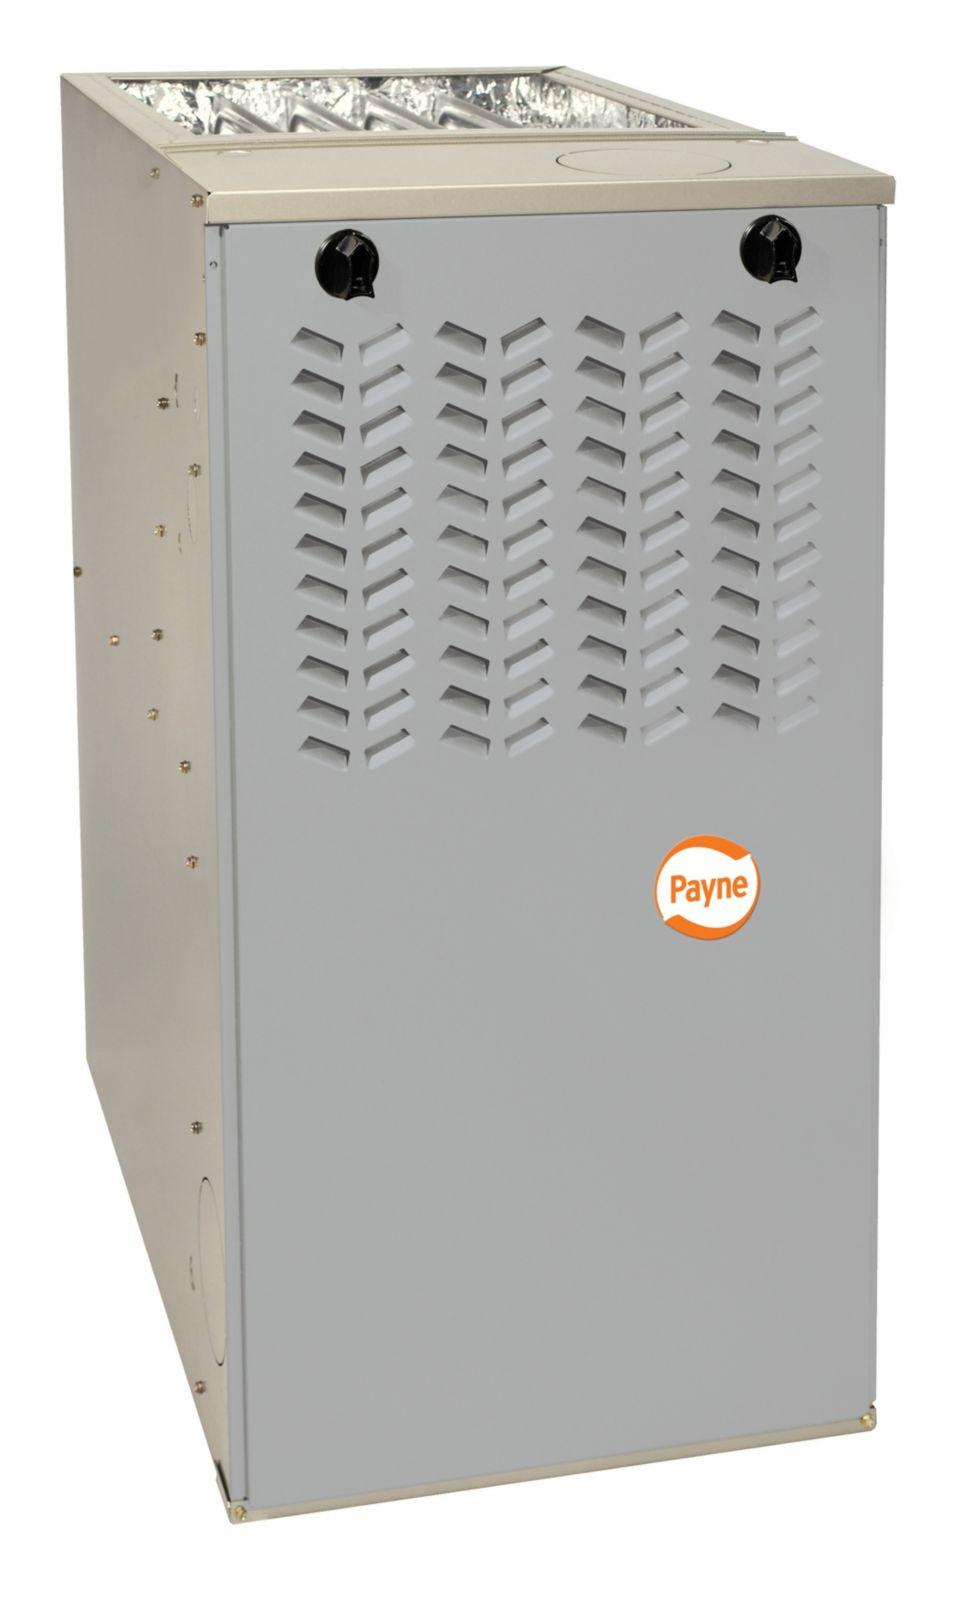 Payne® - 80% AFUE 70000 Btuh Multipoise Gas Furnace